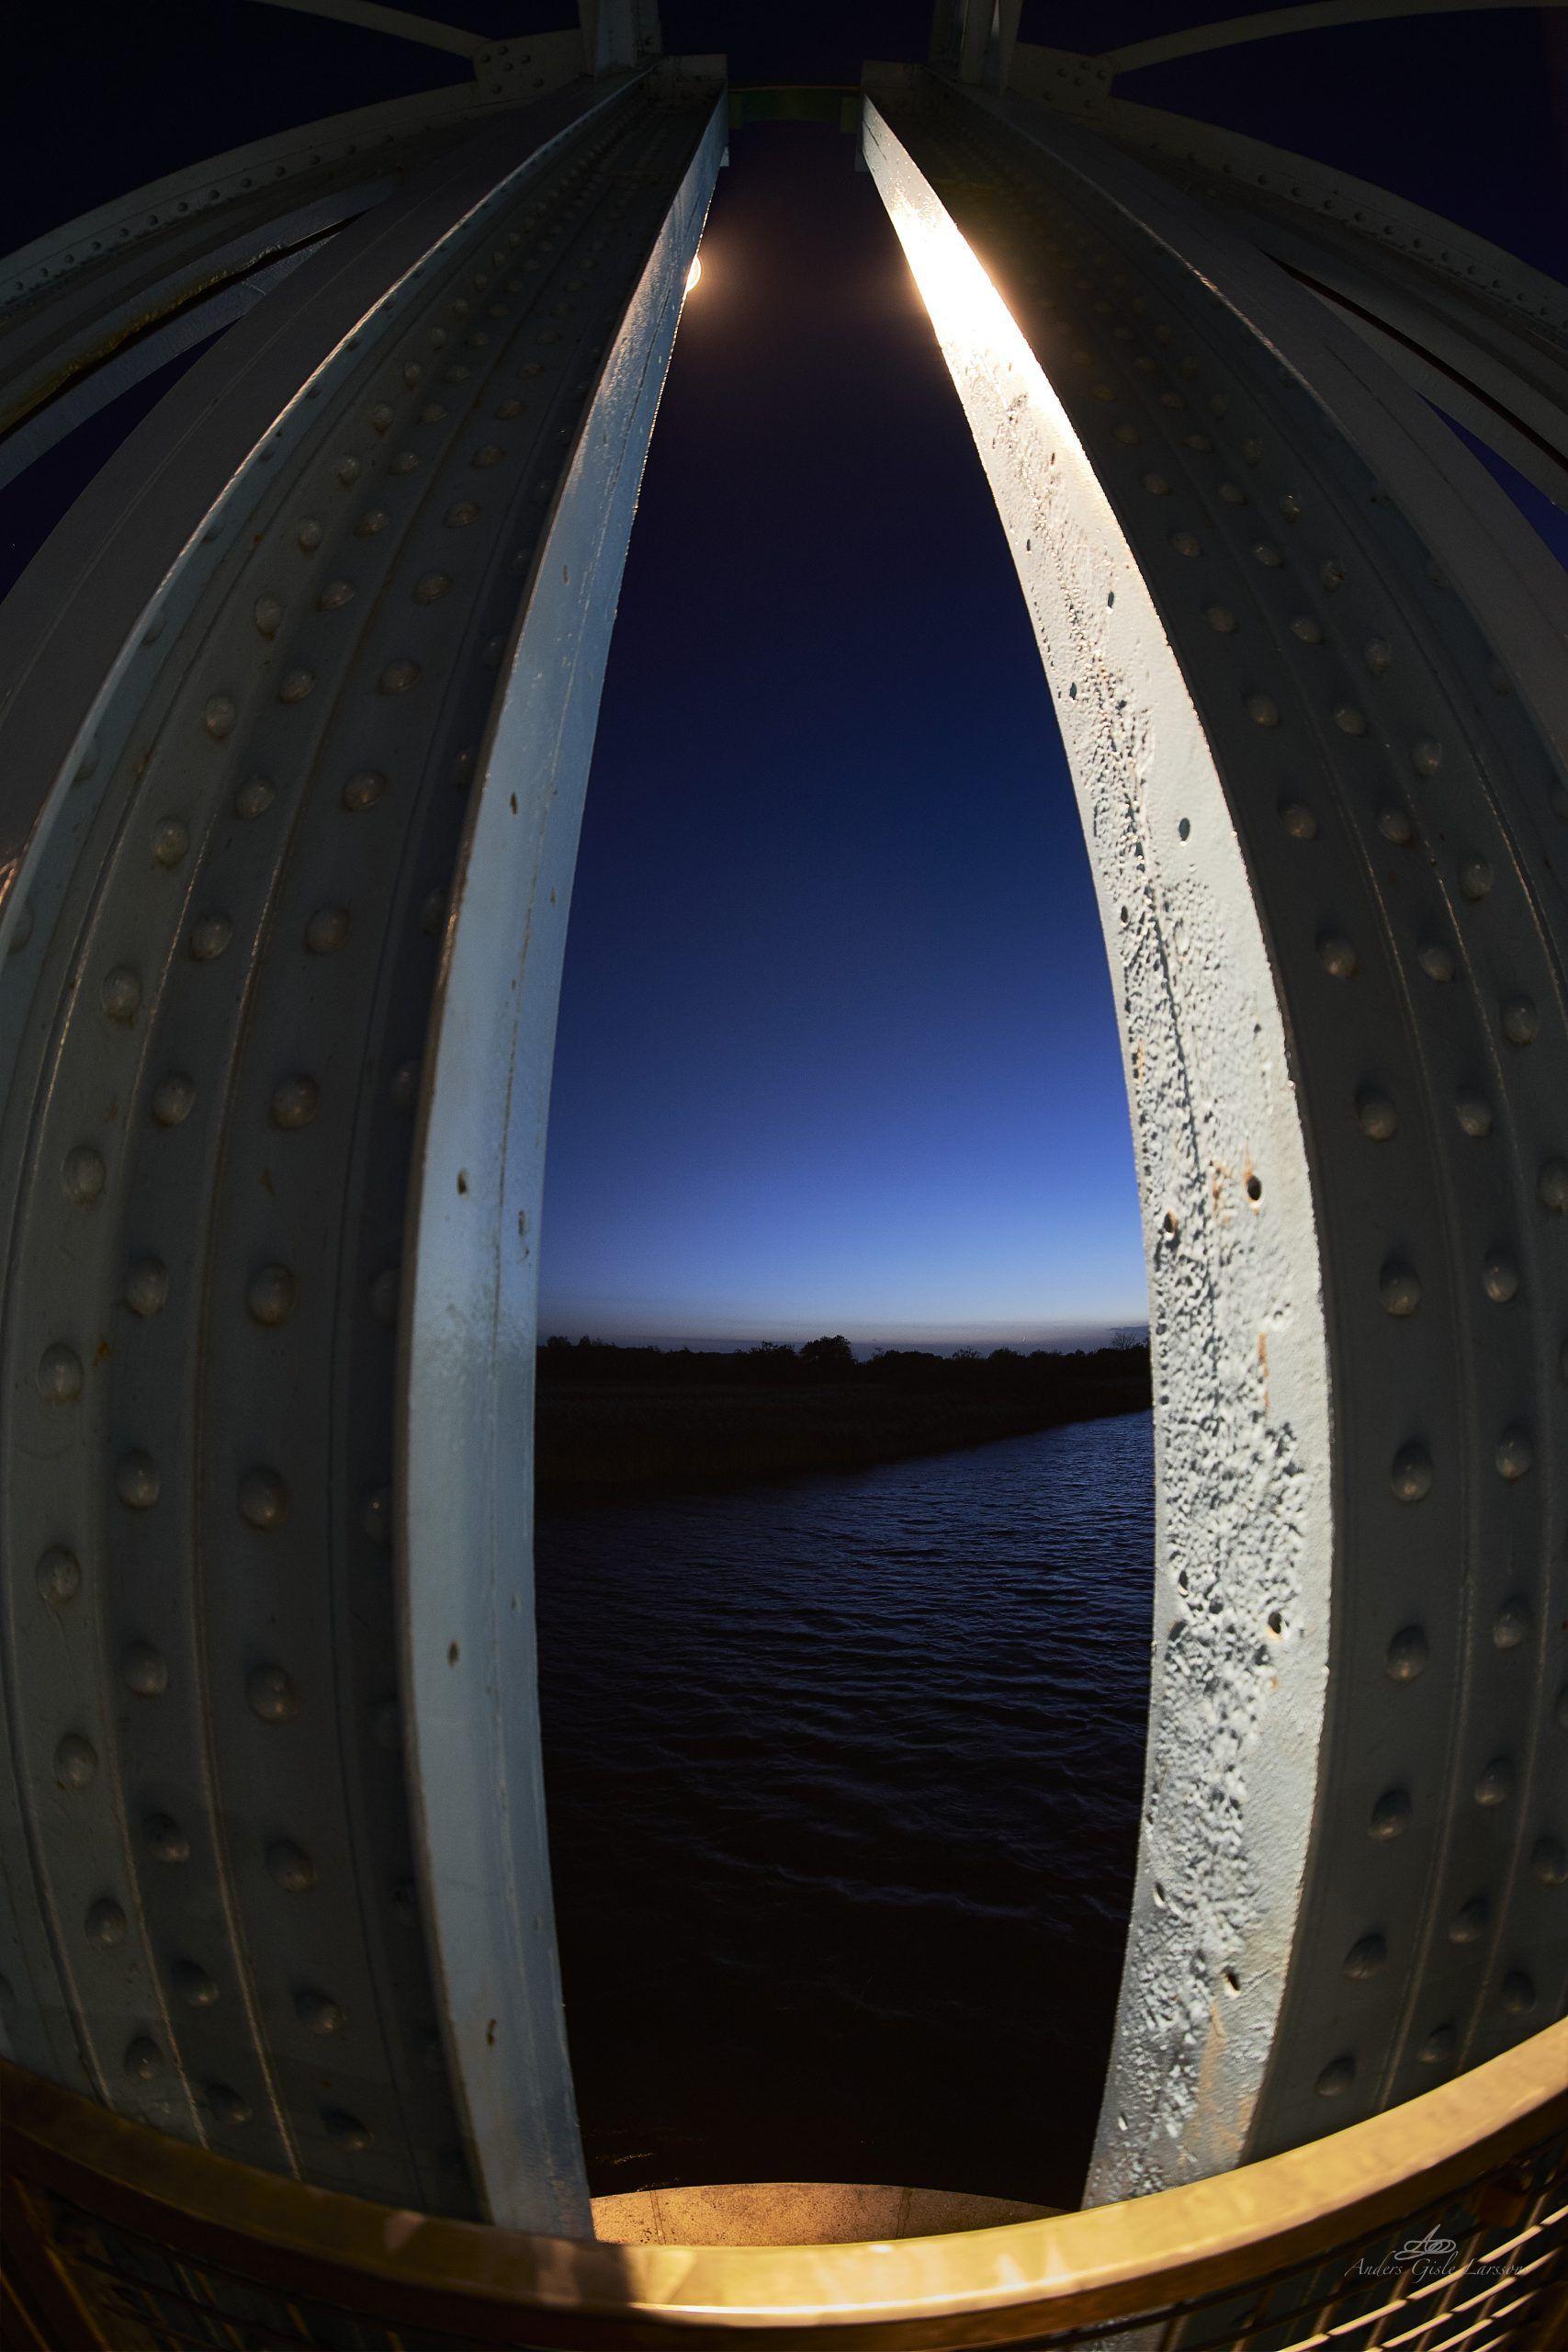 Månestik, Uge 40, Fiskeøje, Punktfoto, Randers